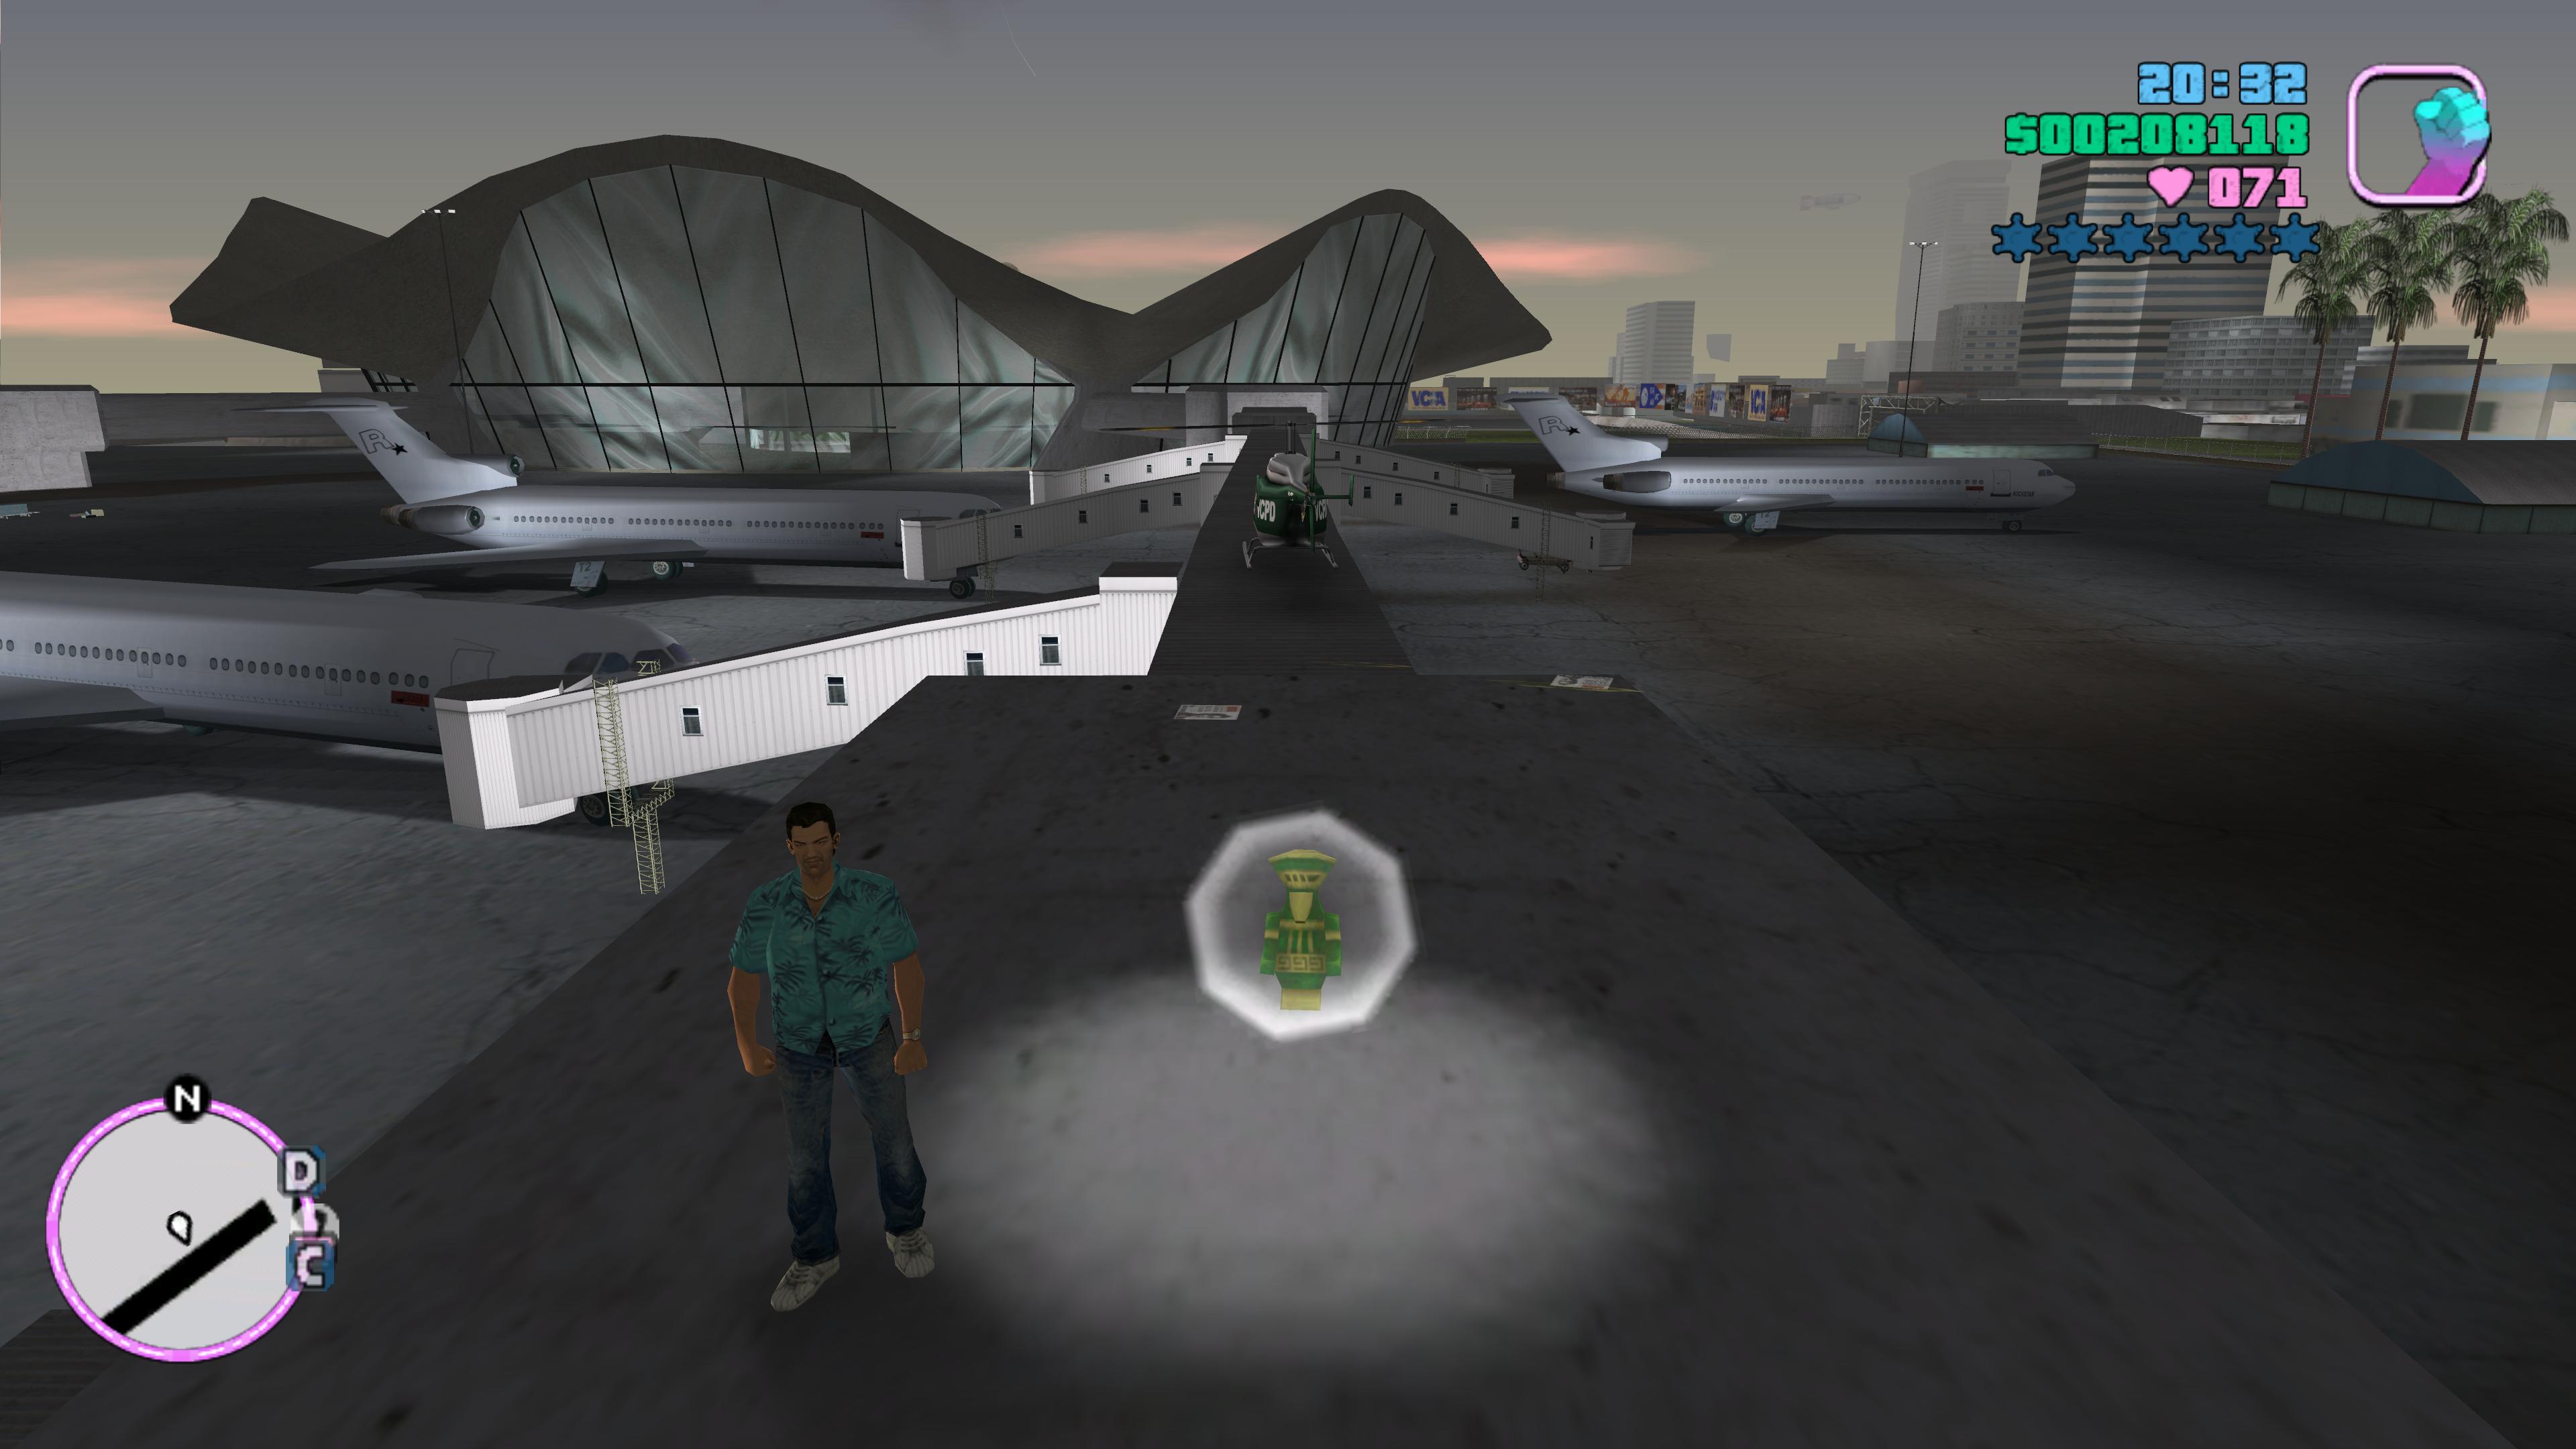 Archivo:GTA VC Objeto Oculto 90.PNG